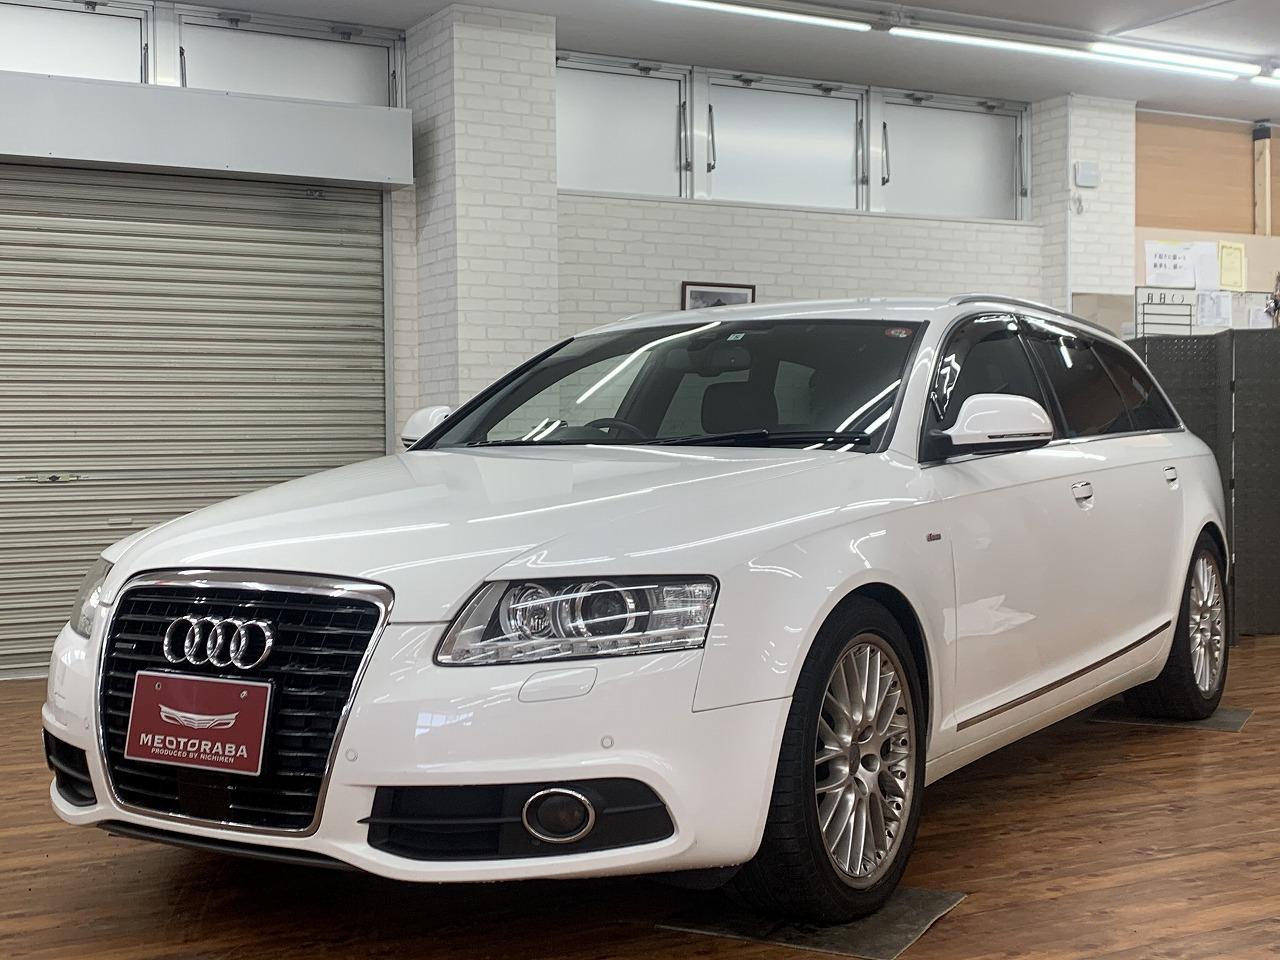 Audi A6 3.0 TFSI クワトロ Sライン 4WD